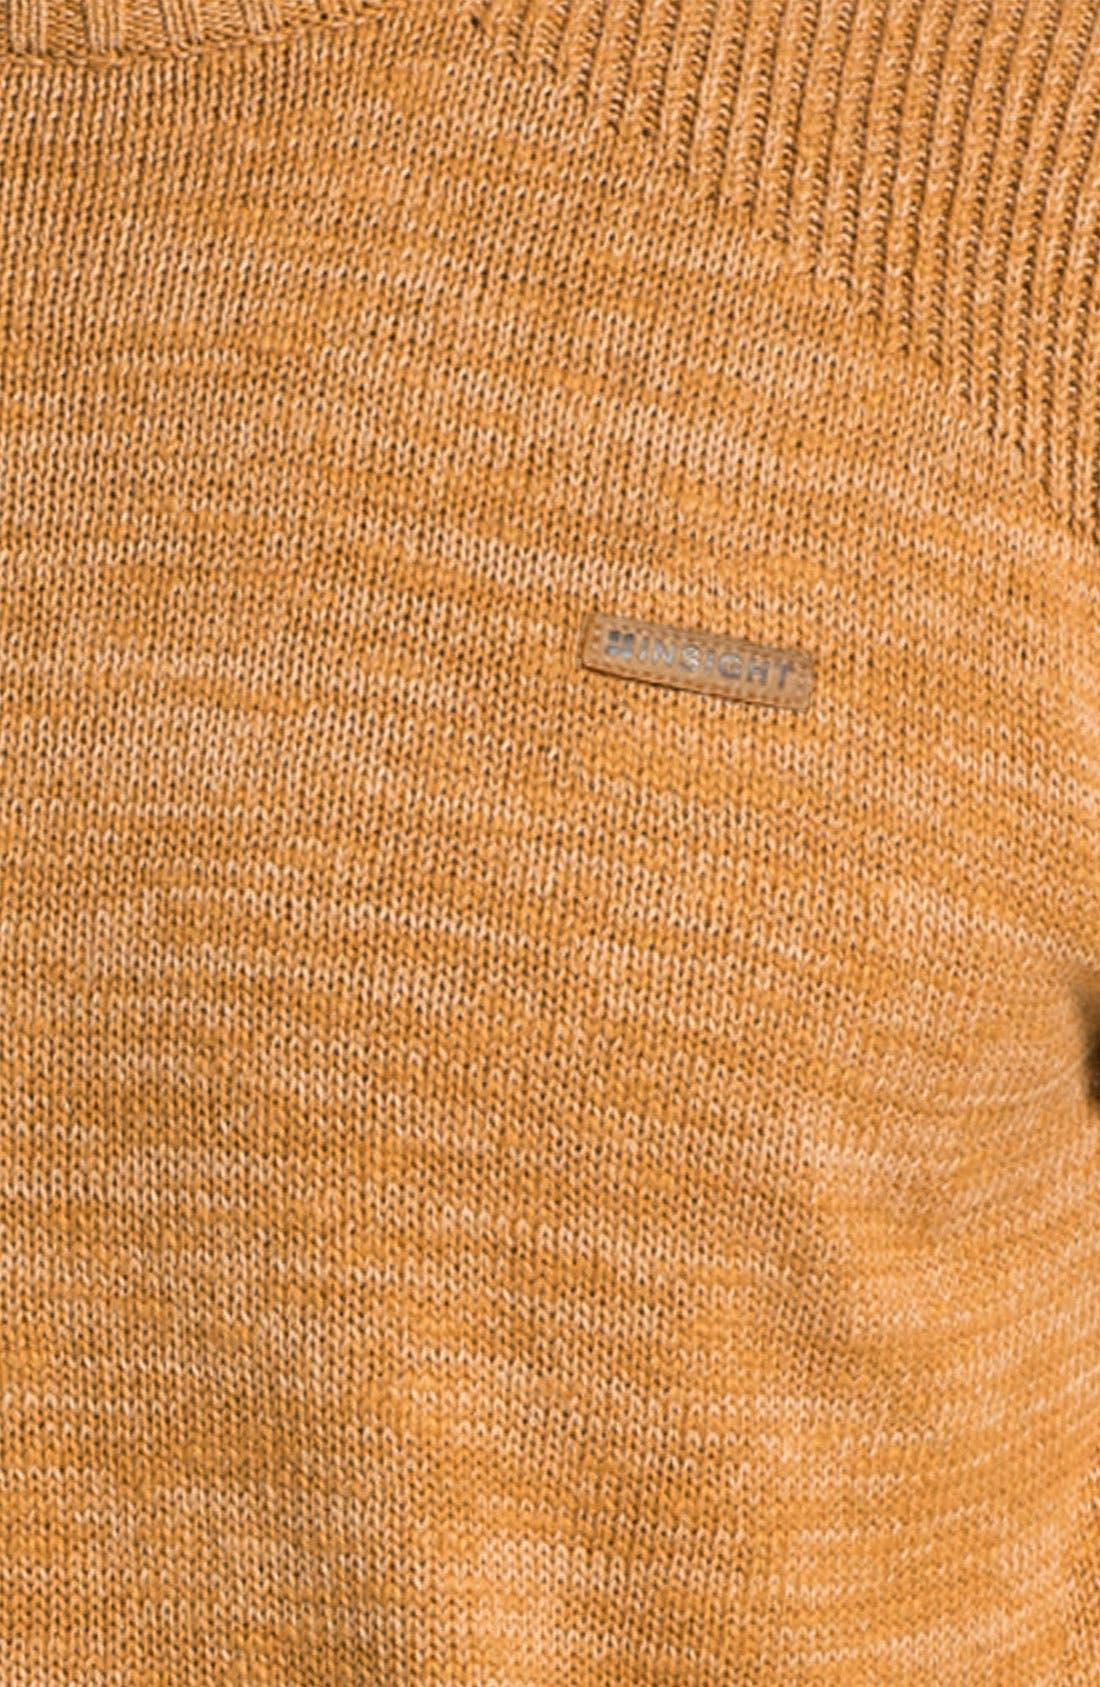 Alternate Image 3  - Insight 'The Meek' Crewneck Sweater